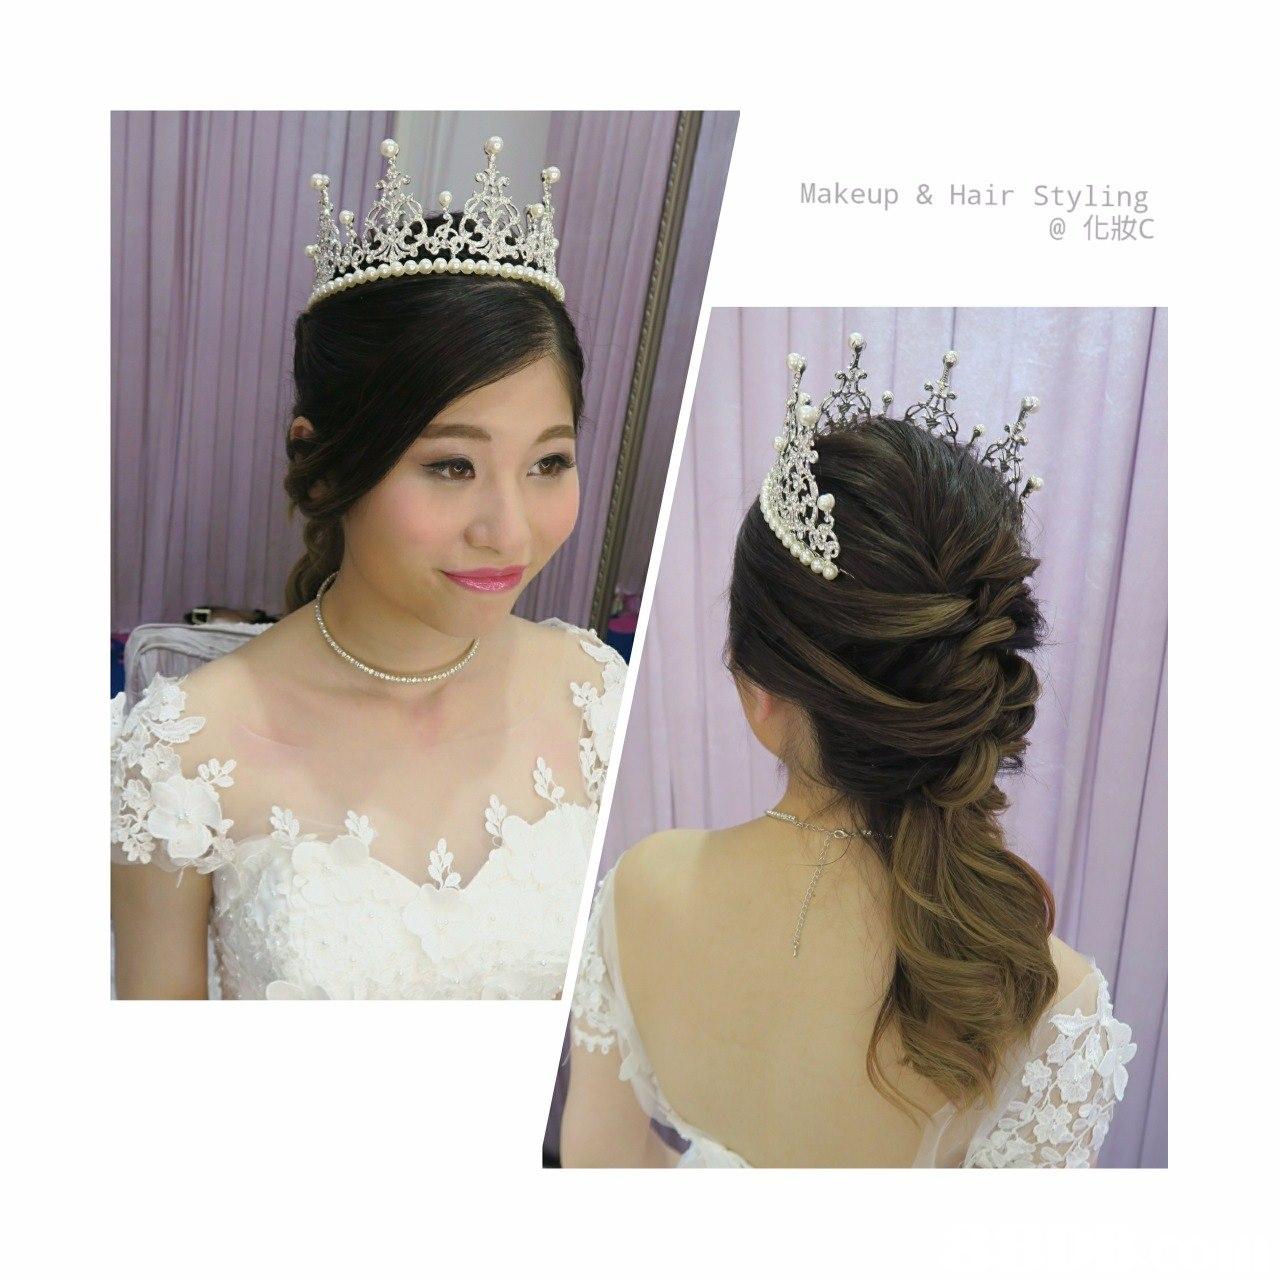 Makeup & Hair Styling @化妝c,headpiece,hair accessory,bride,jewellery,fashion accessory